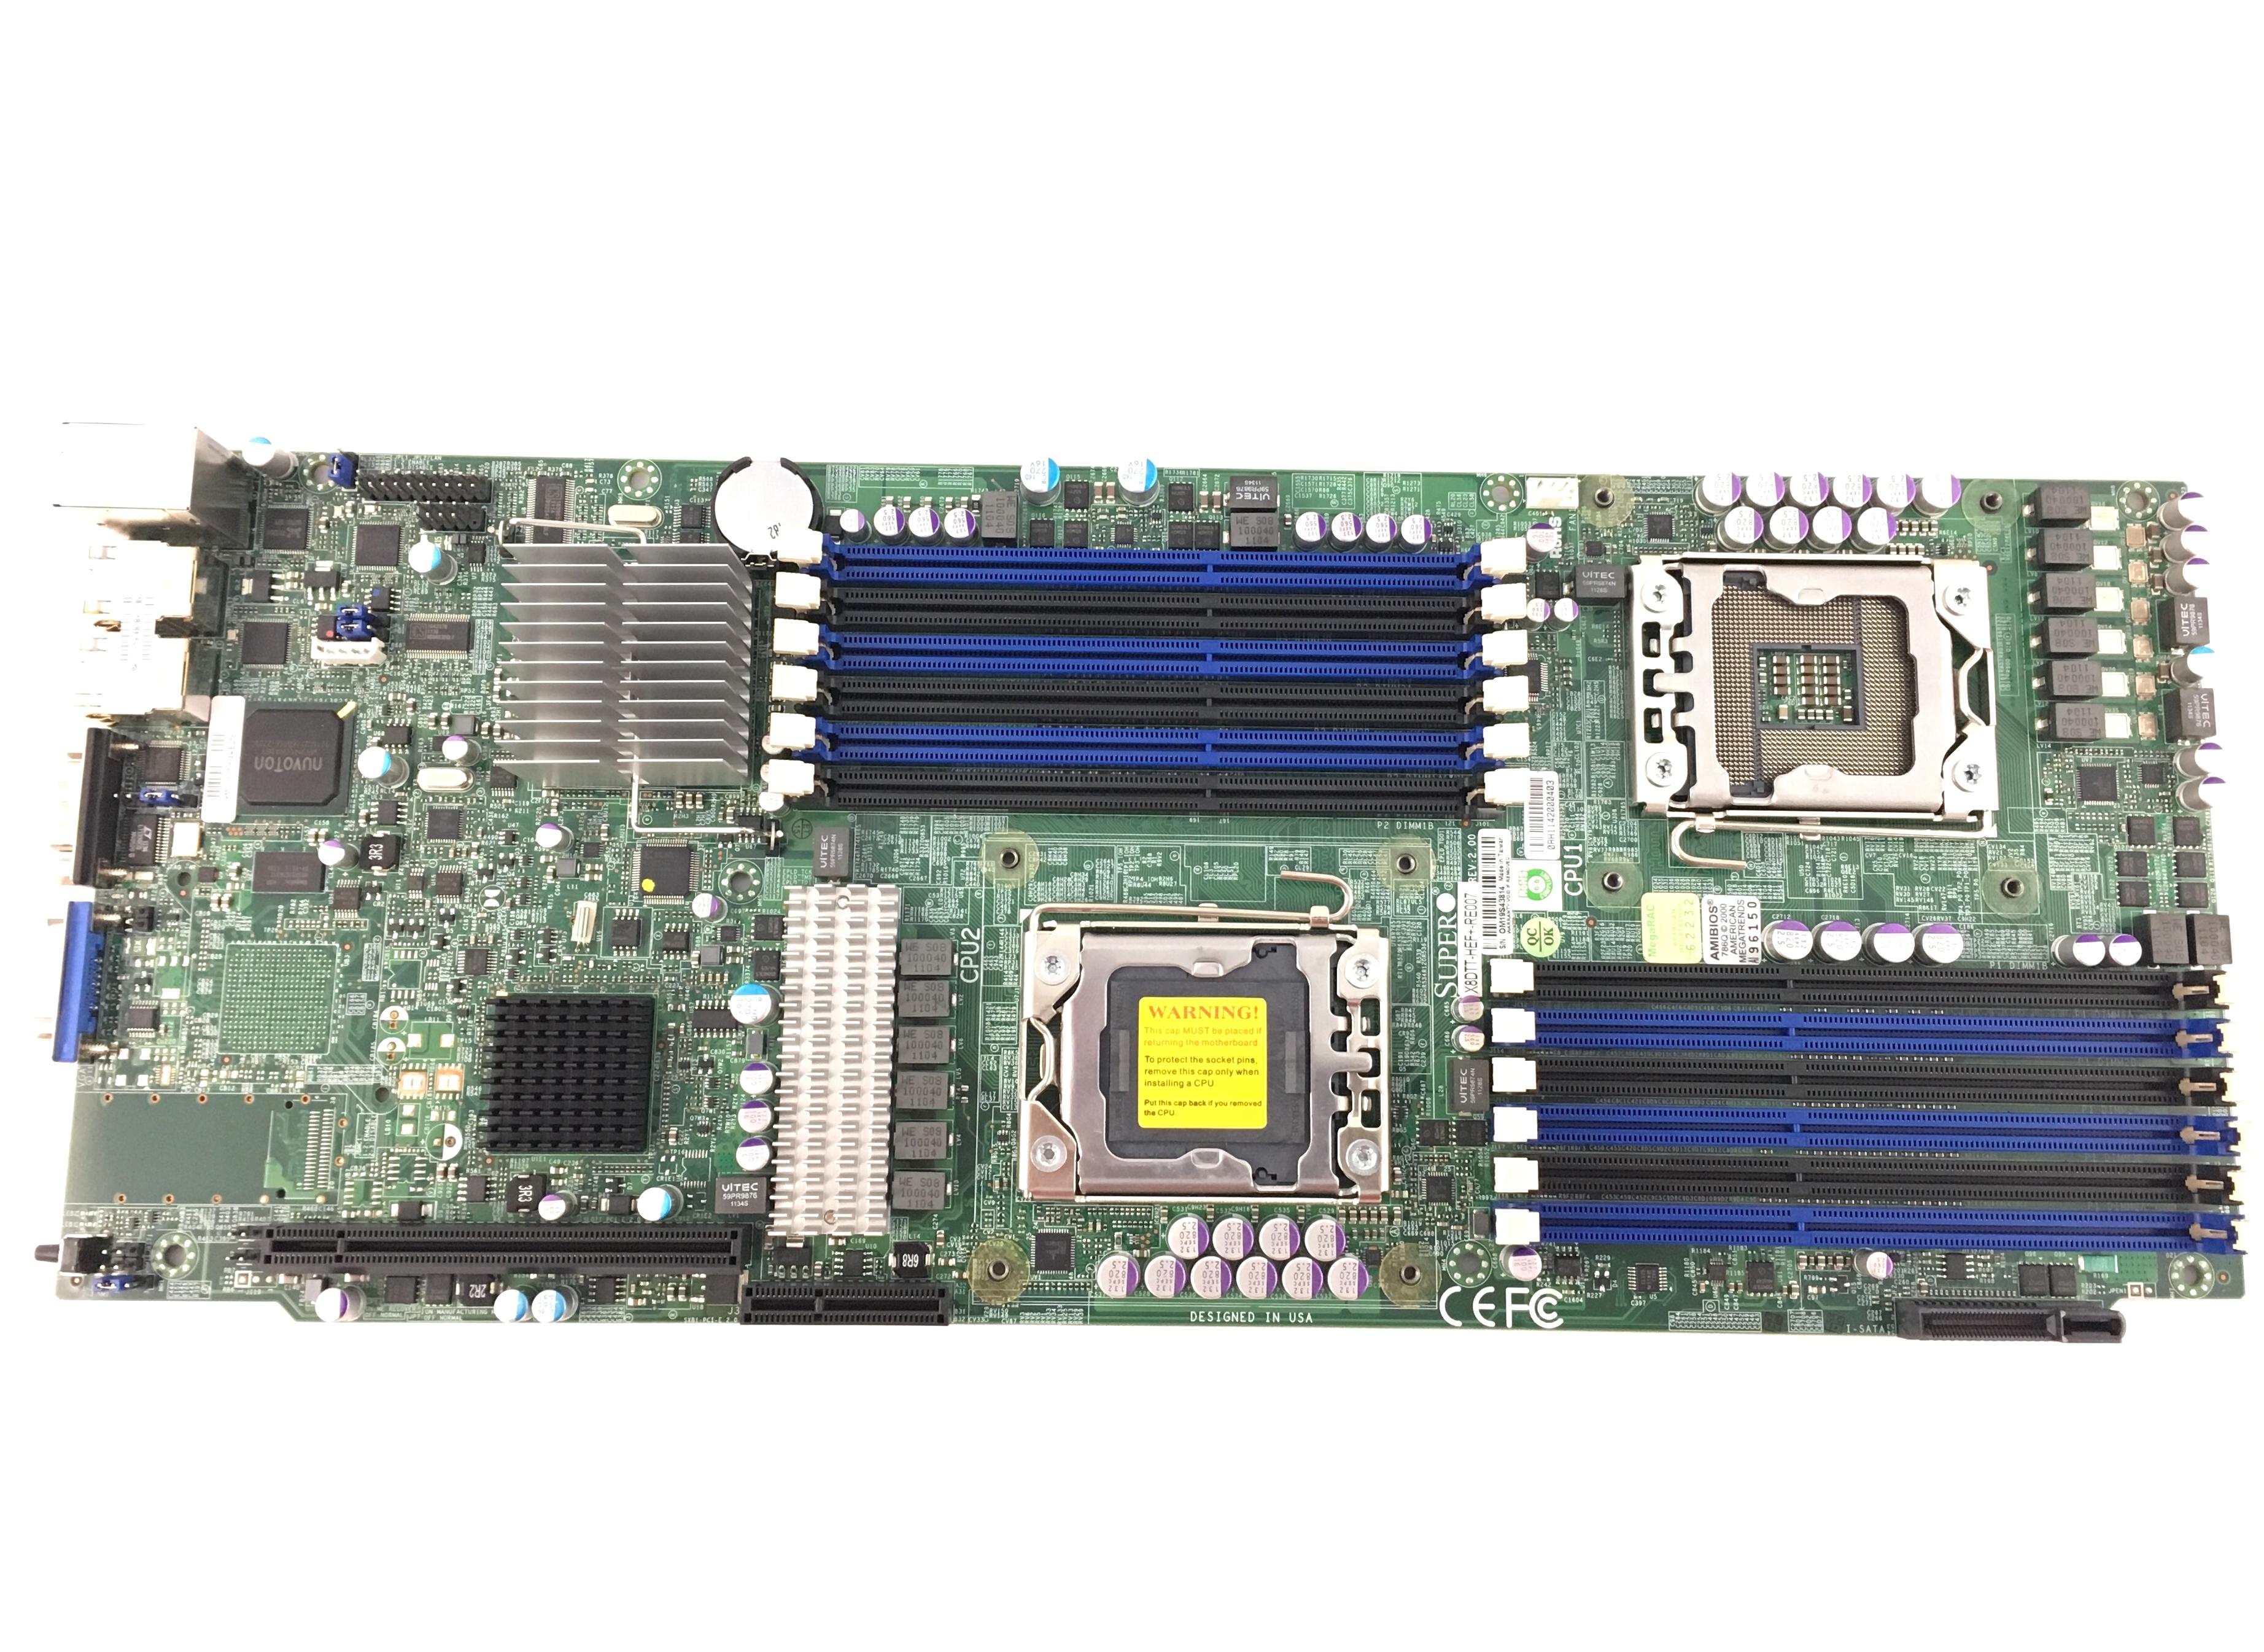 Supermicro Xeon Systemboard (X8DTT-HEF)